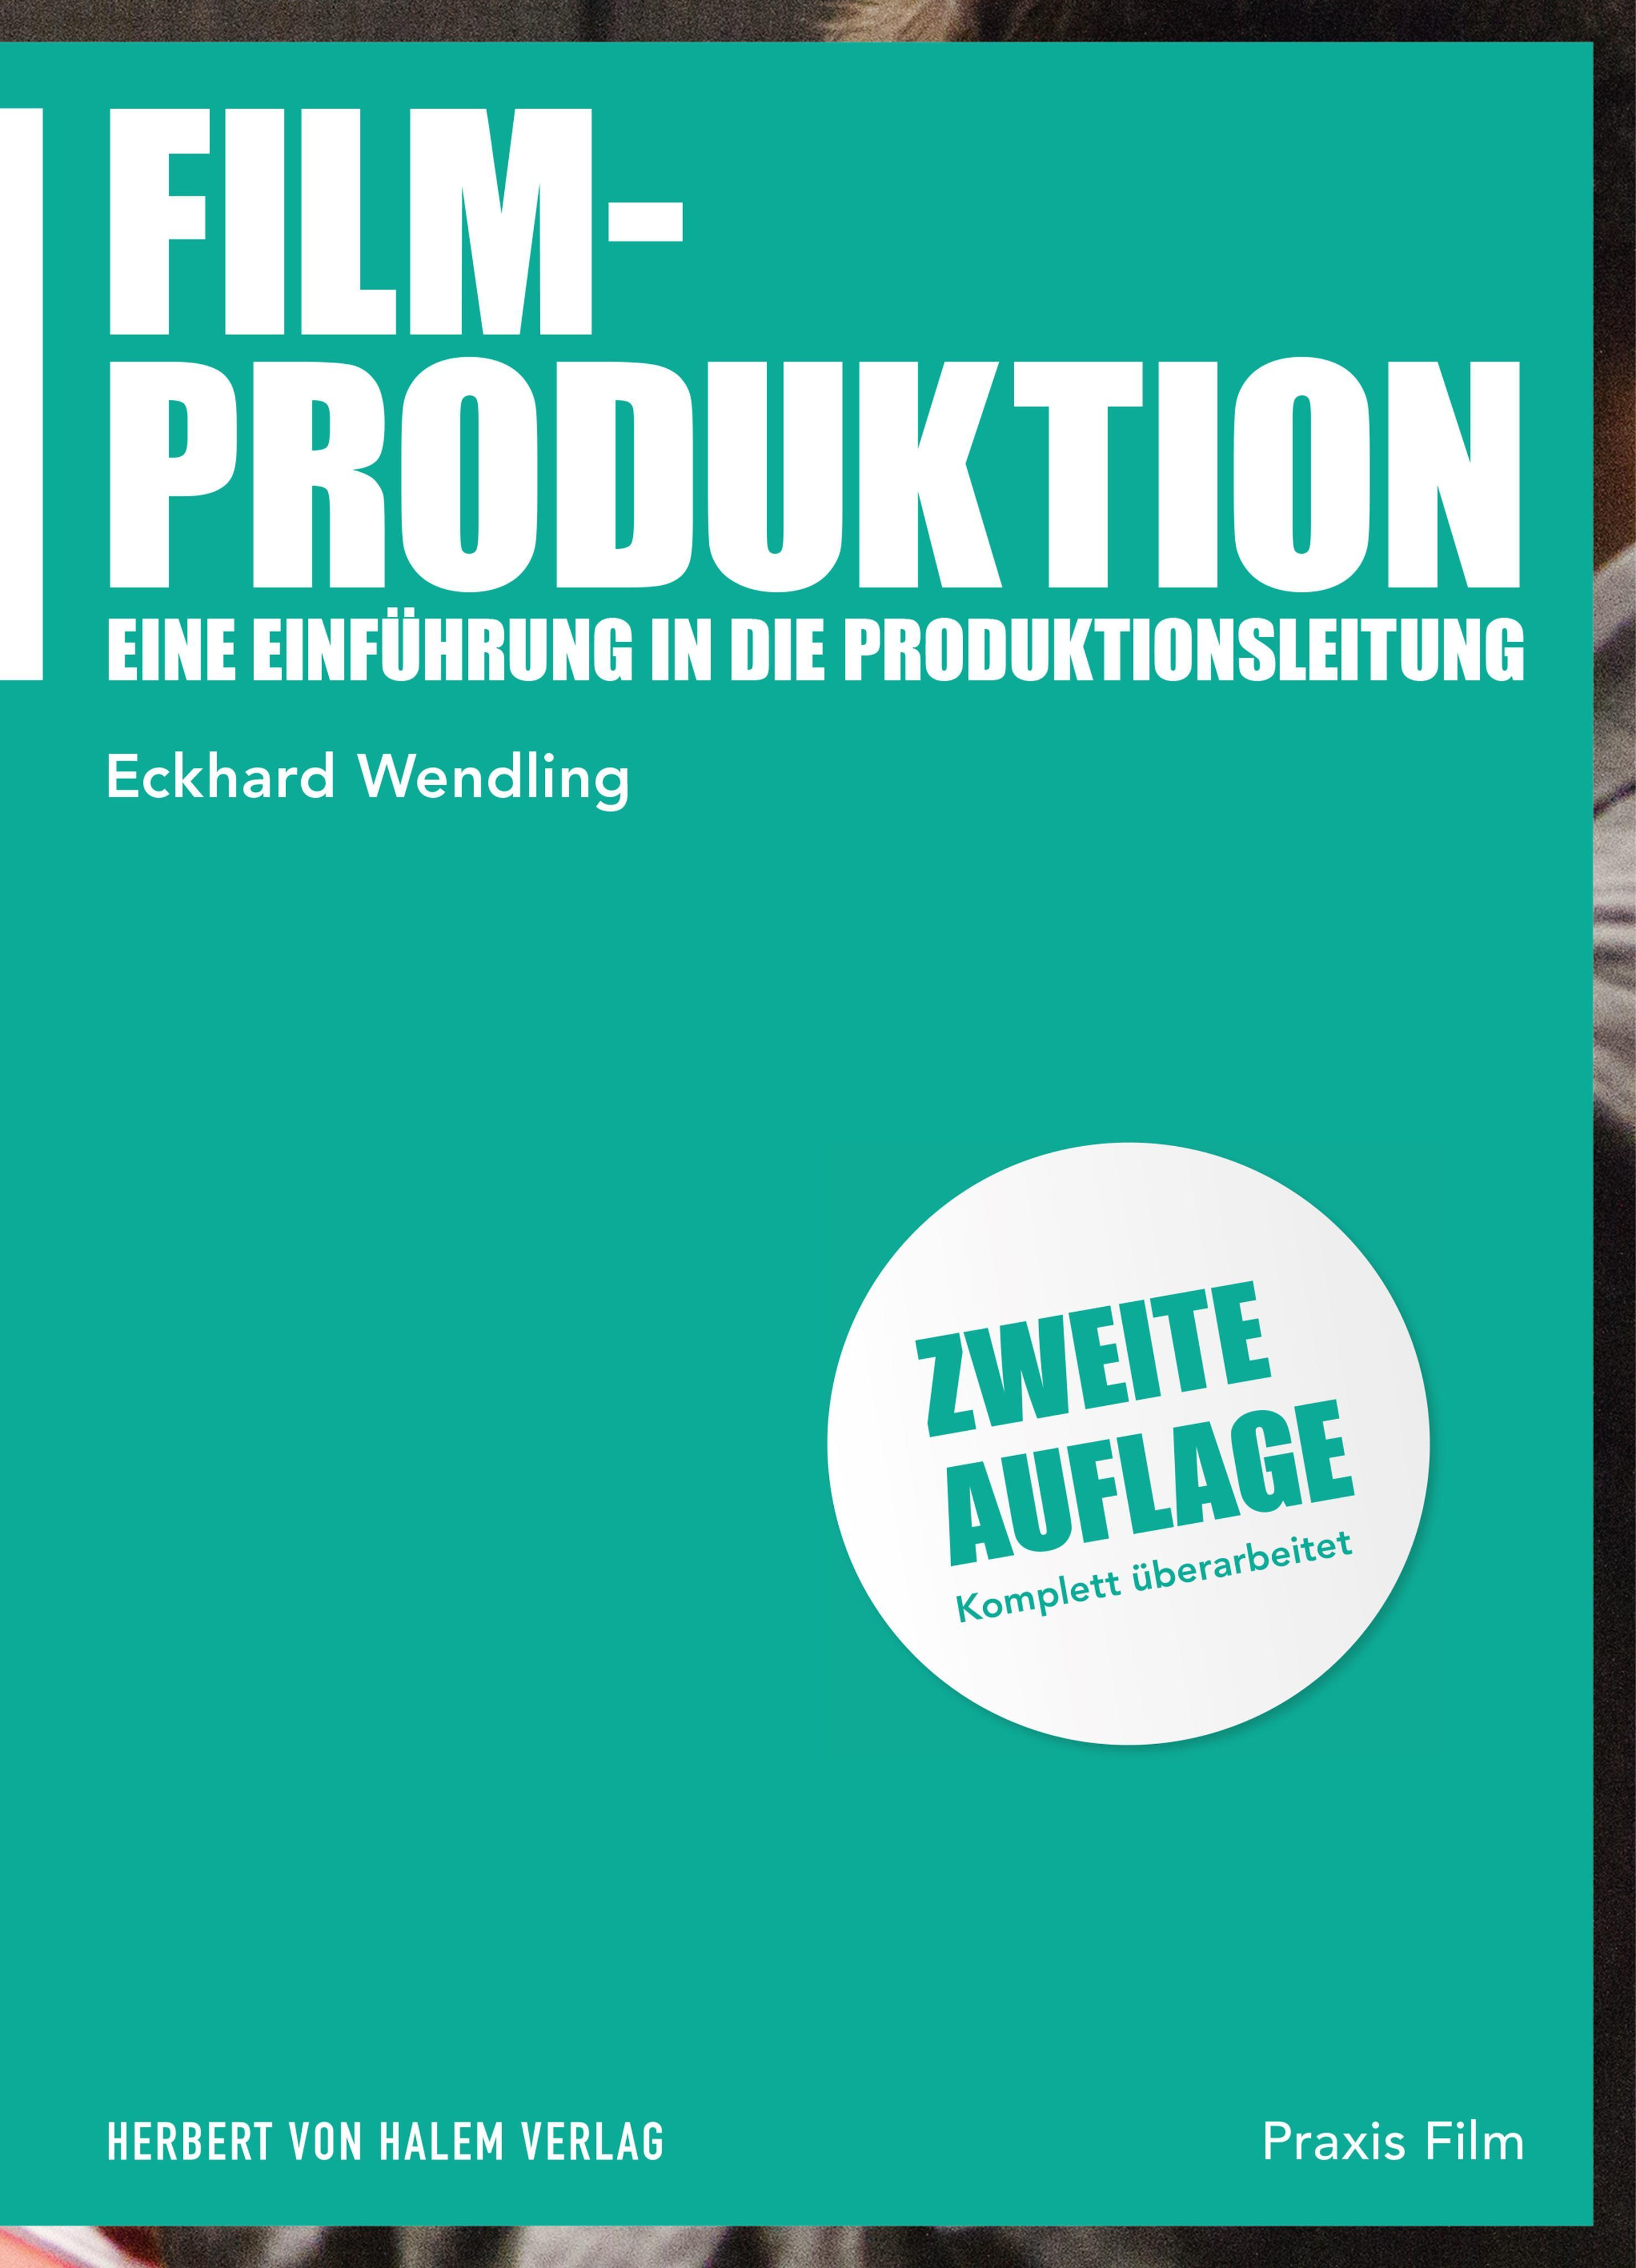 NEU Filmproduktion Eckhard Wendling 505543